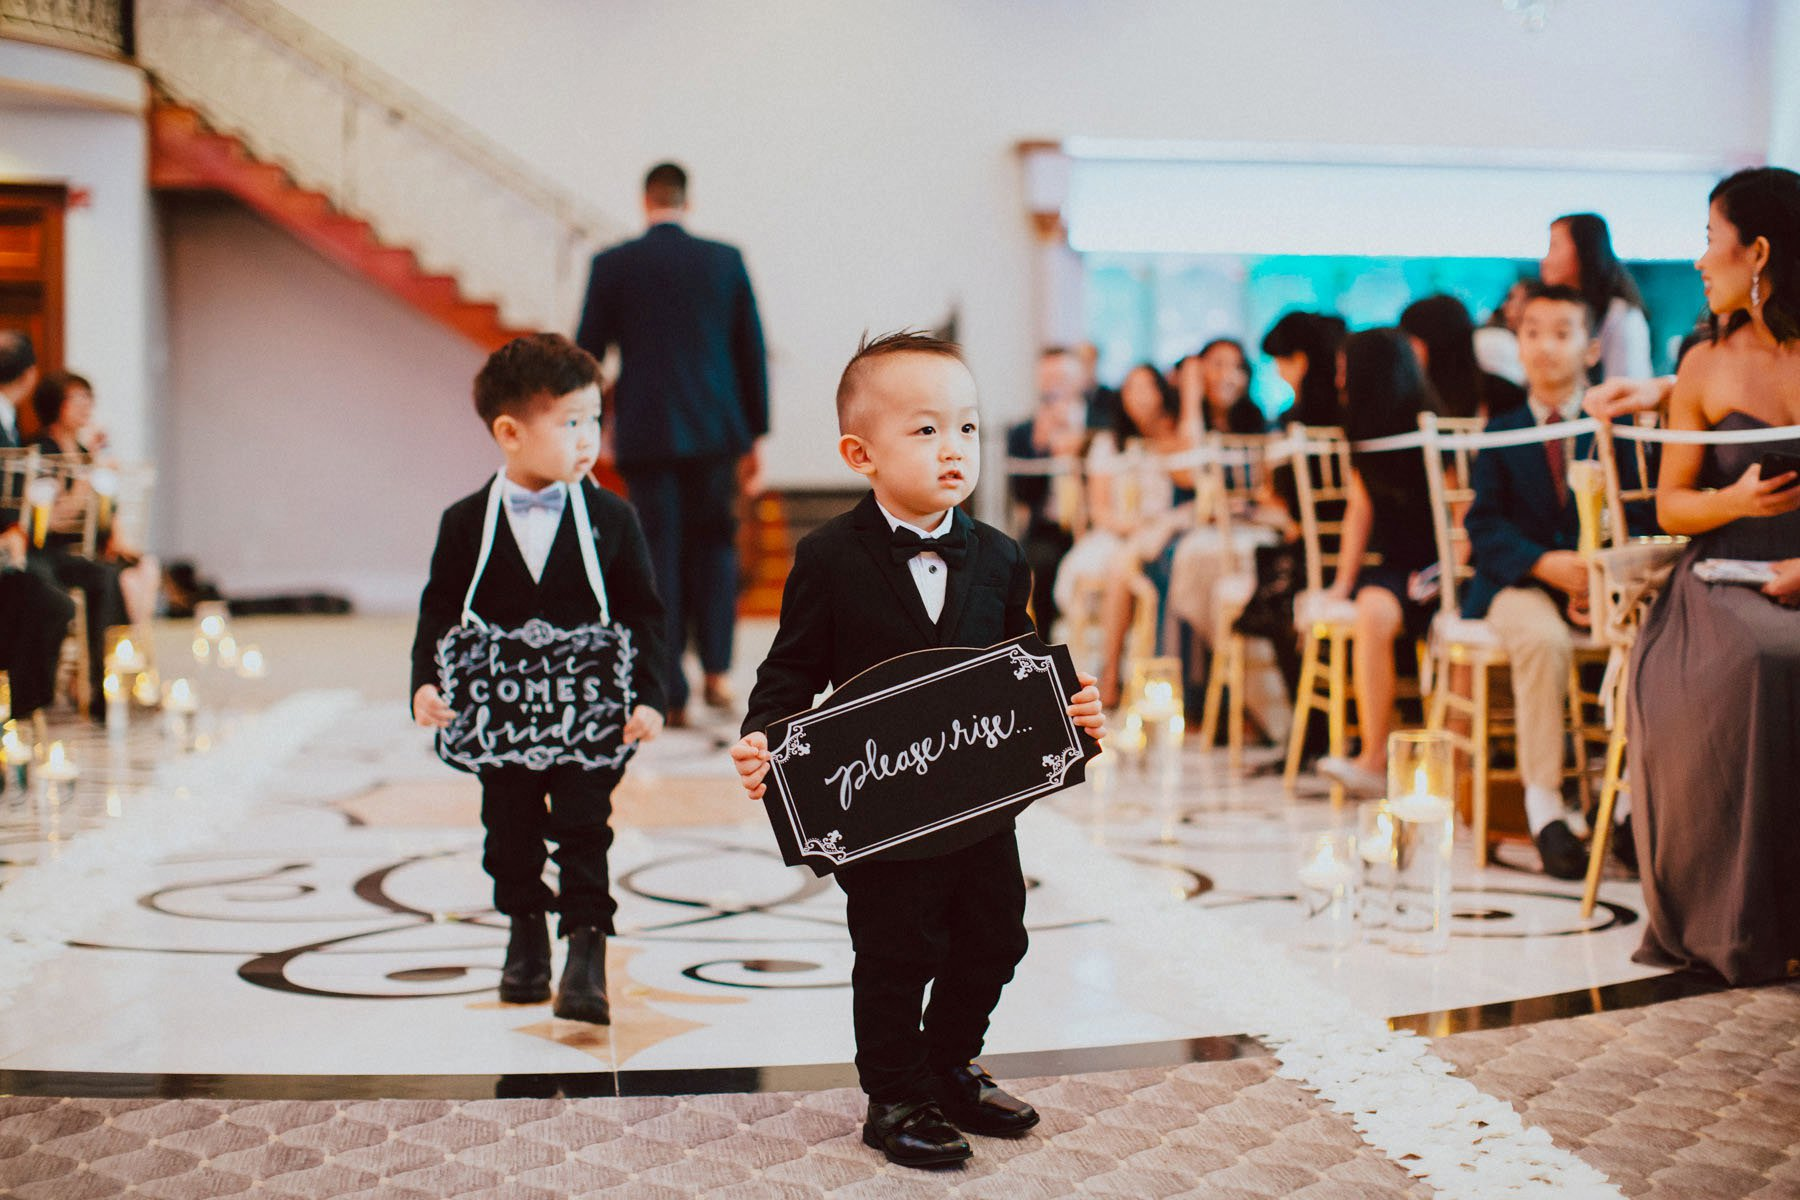 philadelphia-wedding-photographer-106.jpg